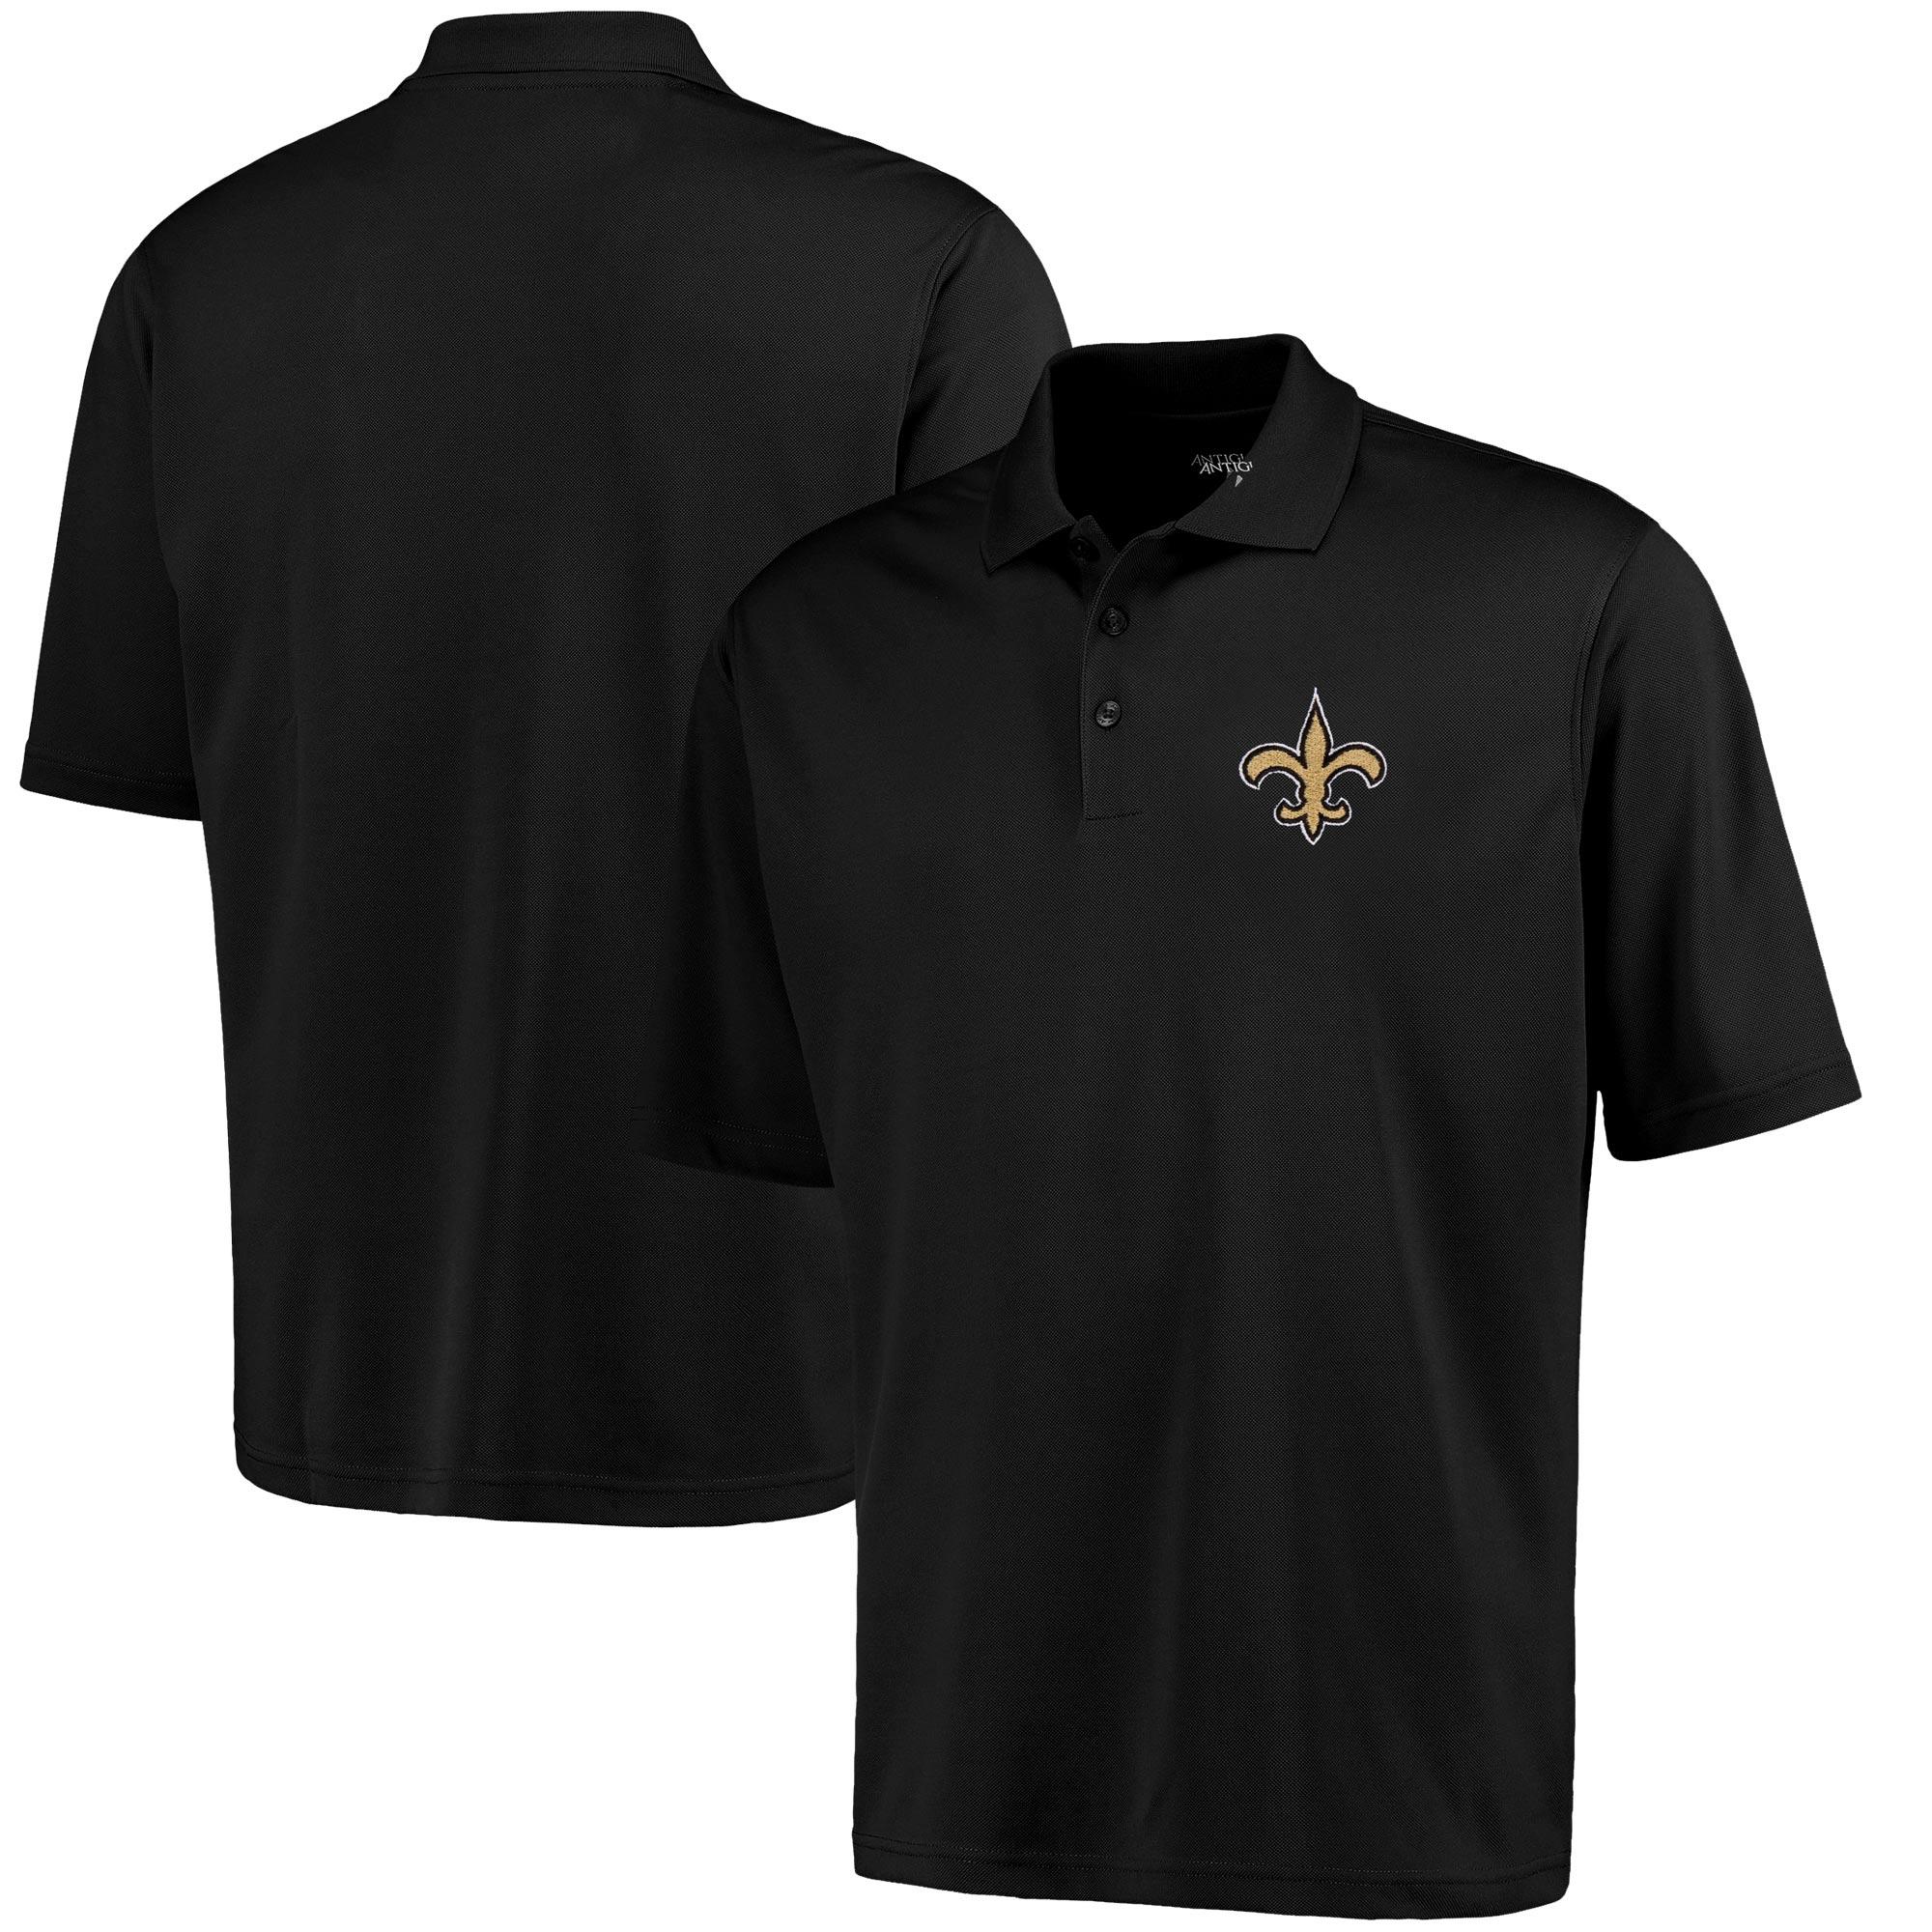 New Orleans Saints Antigua Pique Xtra-Lite Polo - Black